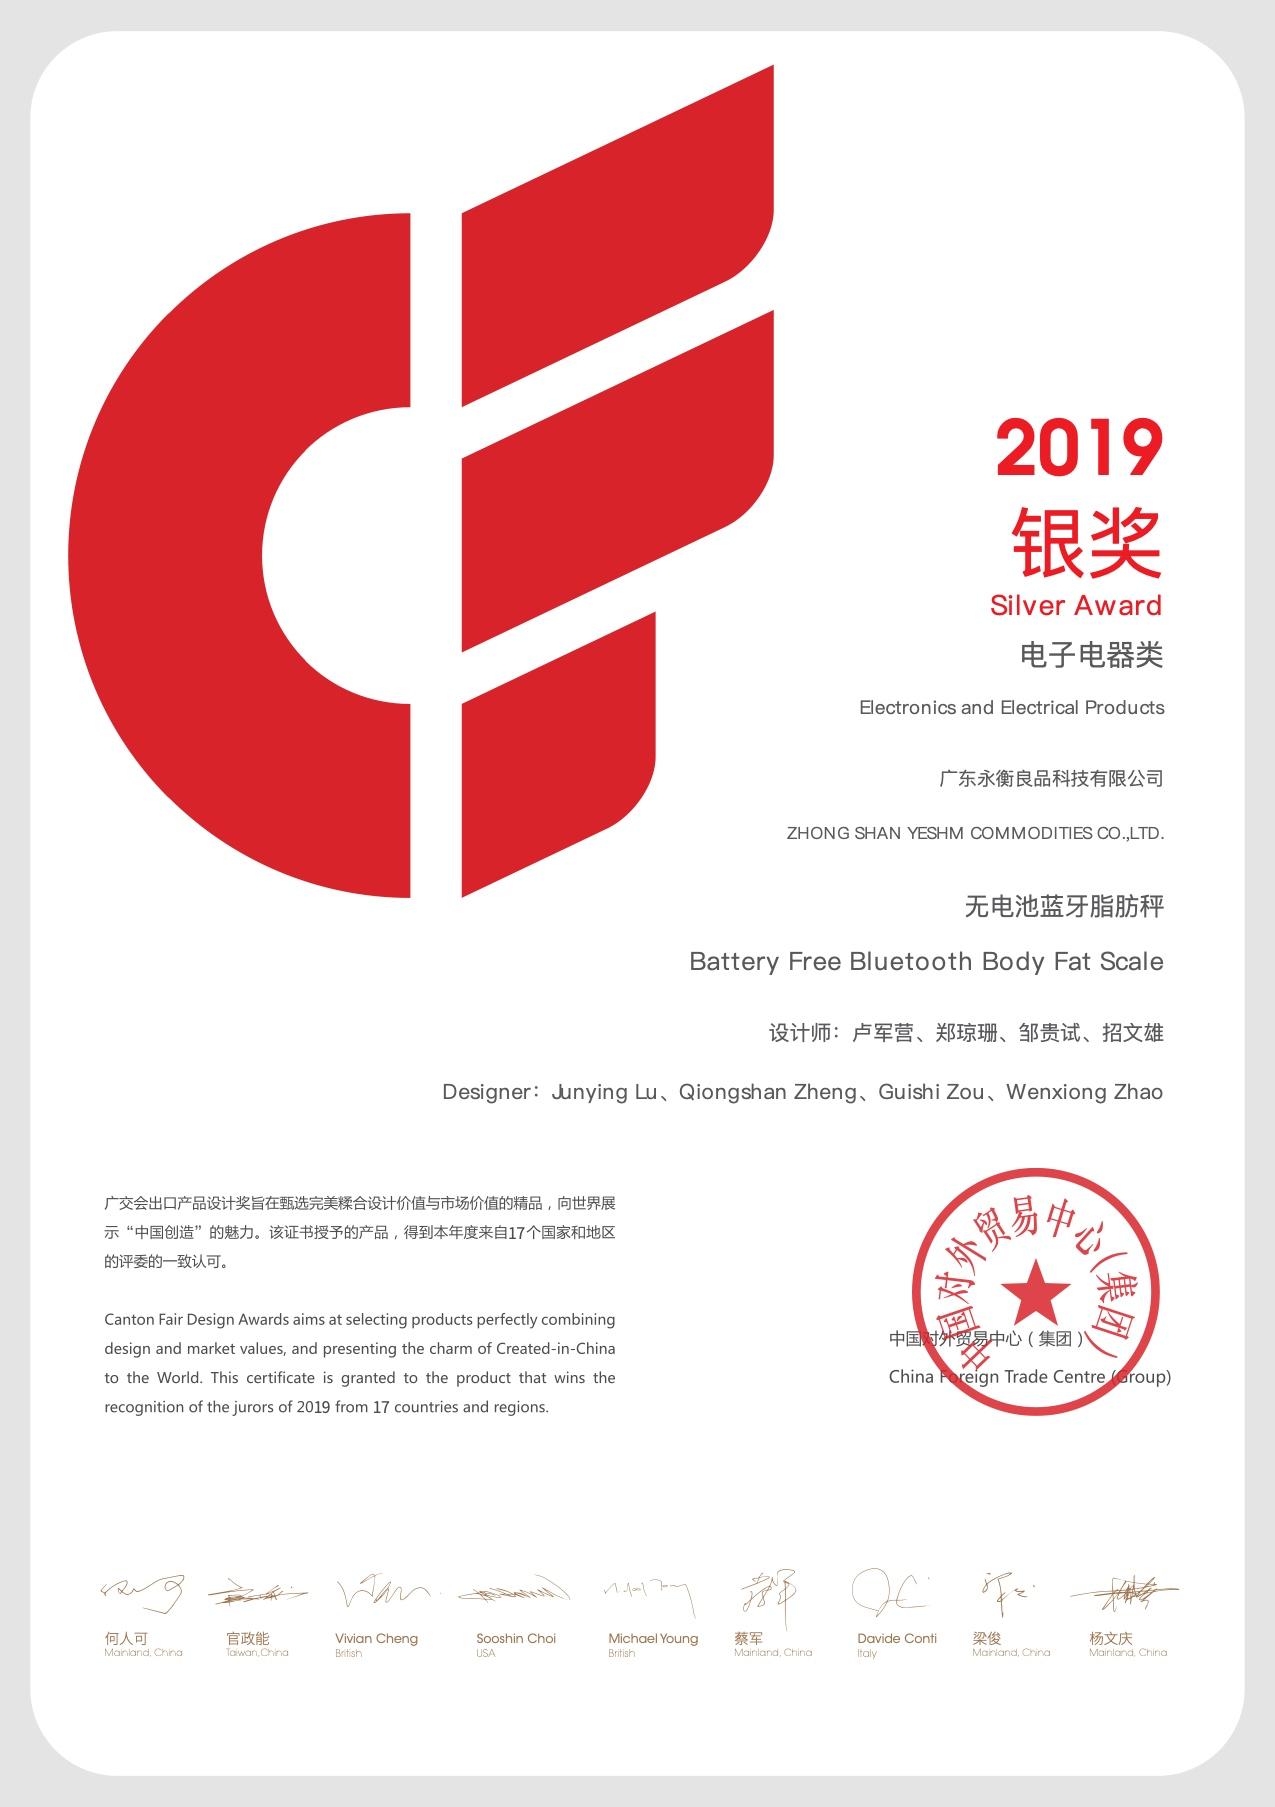 CF设计银奖 (2019年)